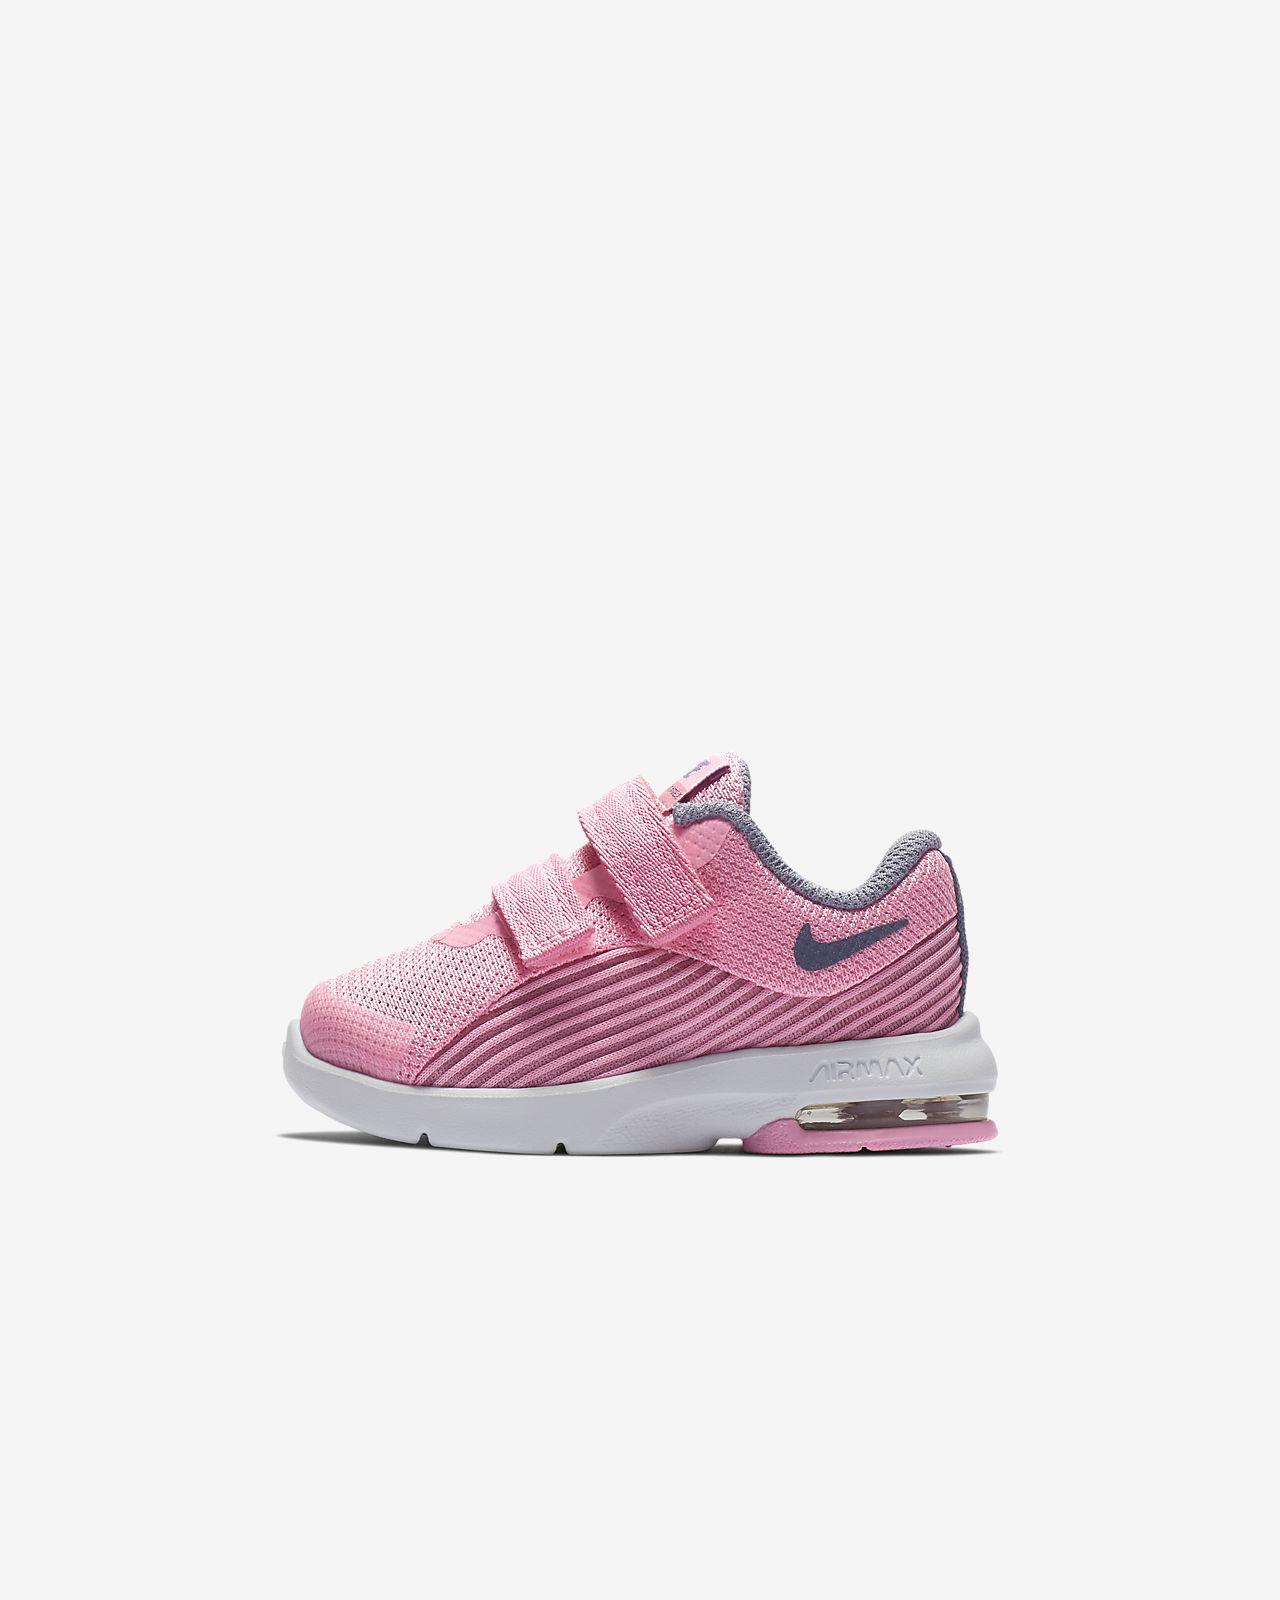 Nike Air Max Advantage 2 (TDV) 婴童运动童鞋